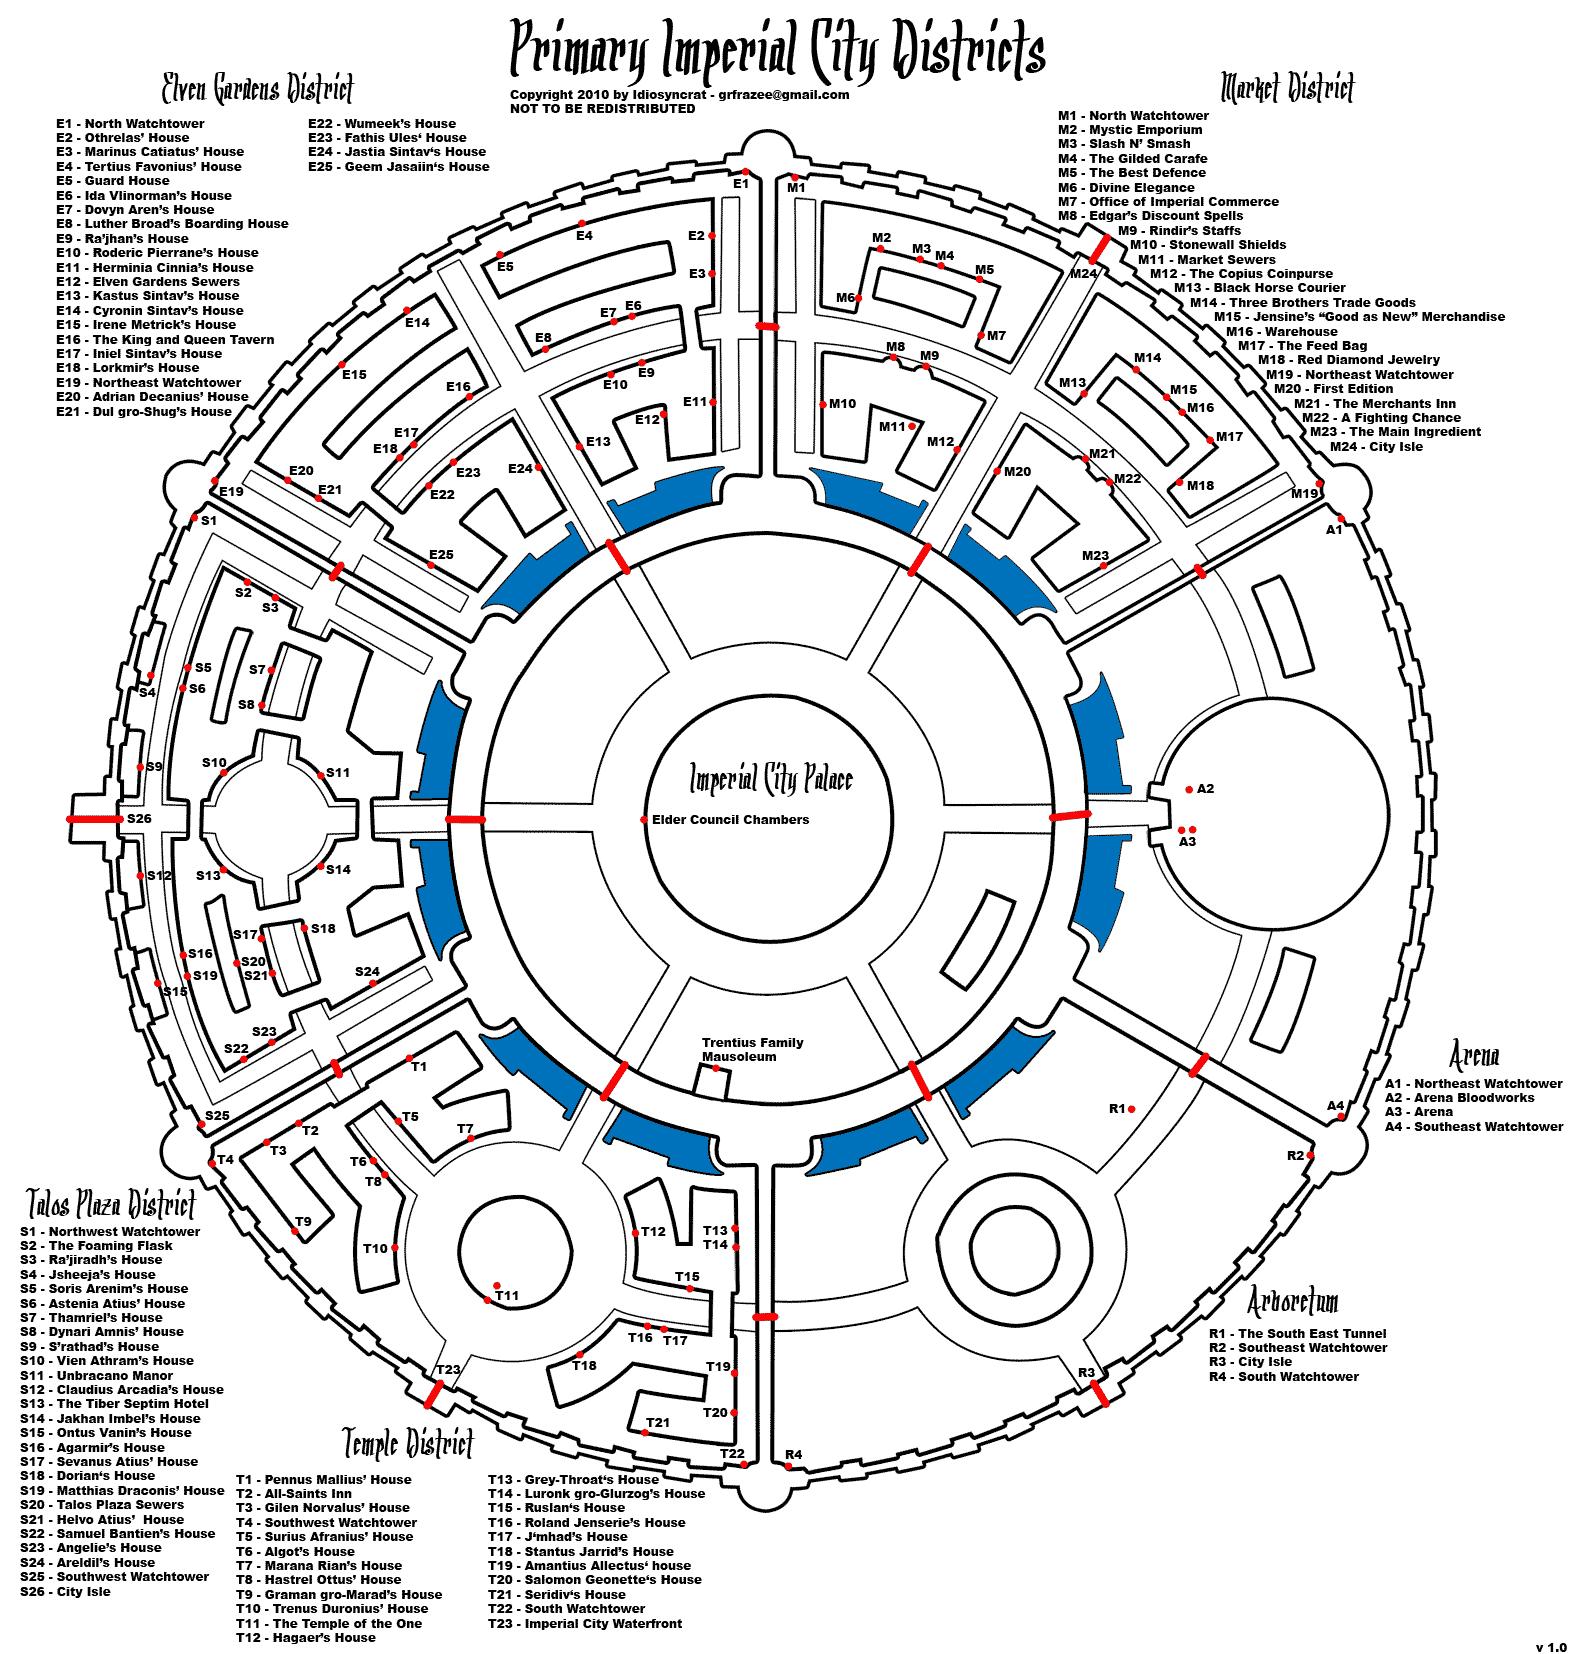 The Elder Scrolls IV: Oblivion Primary Imperial City